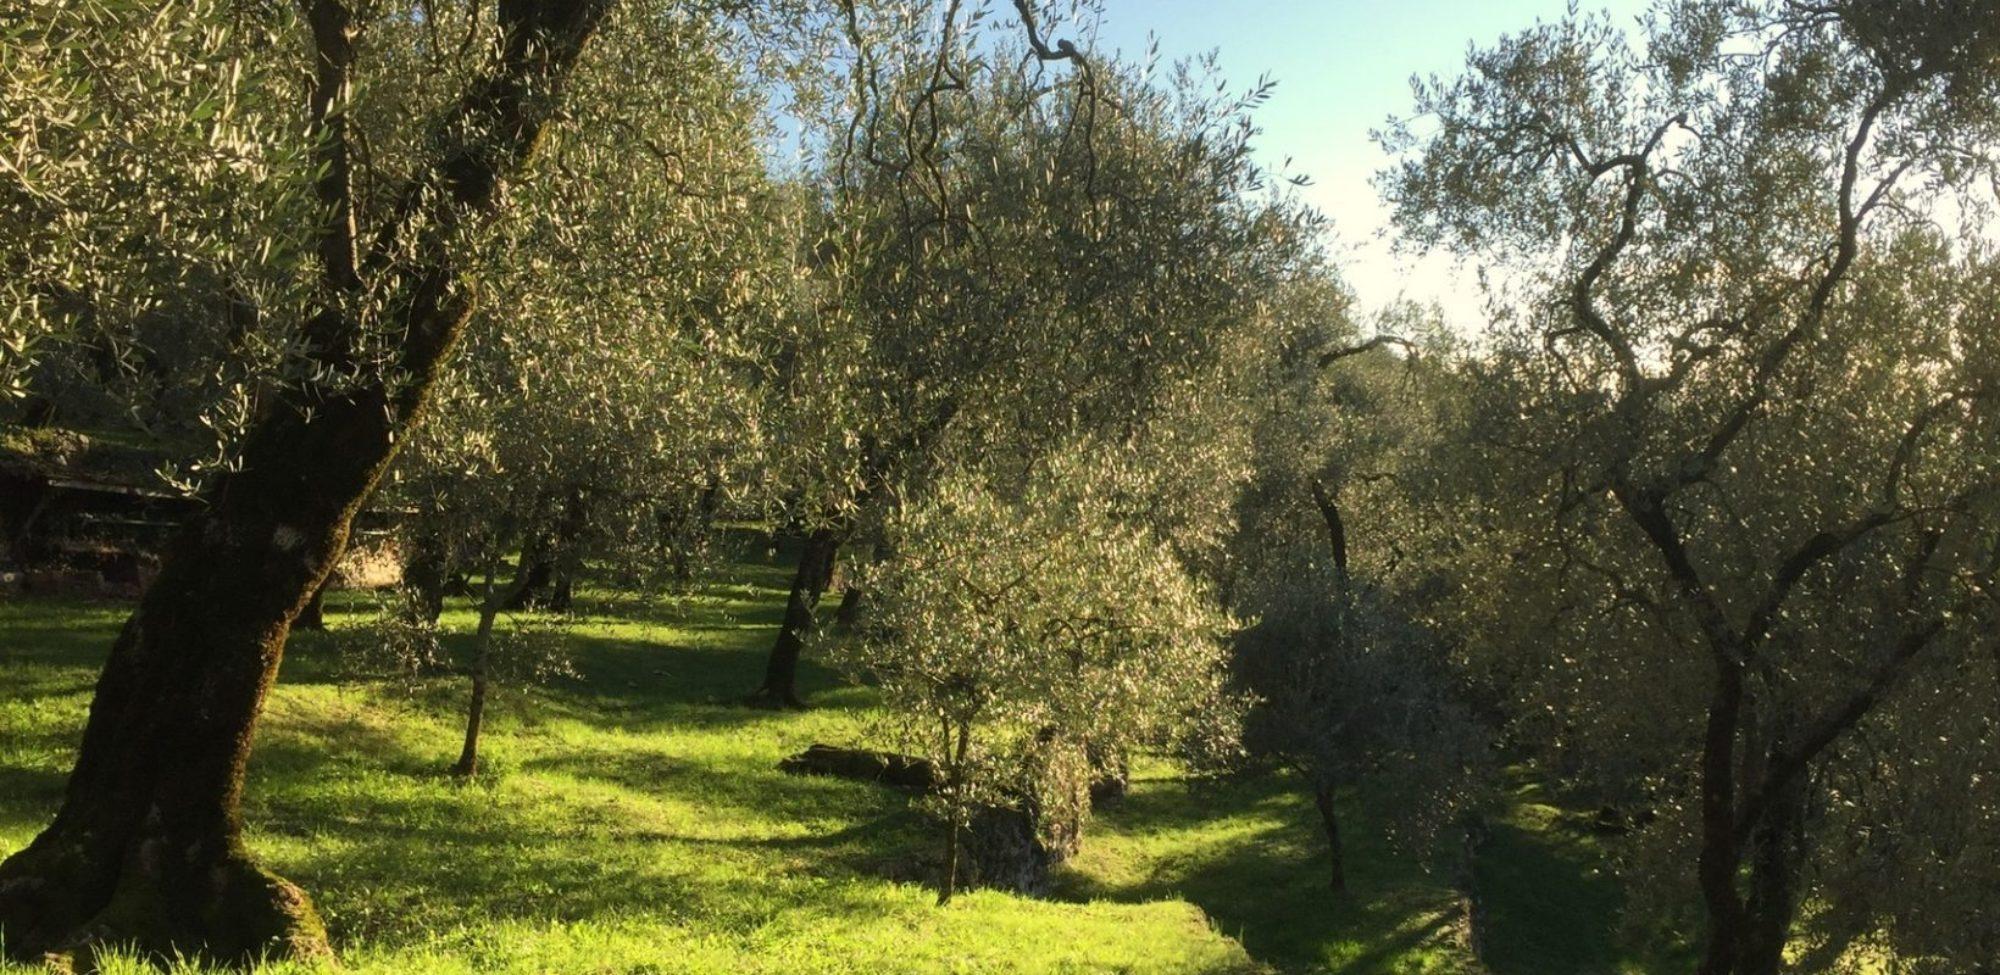 Olivenöl aus eigenem Anbau!  Alles Ausverkauft. Dezember 2020 kommt das nächste Olivenöl.